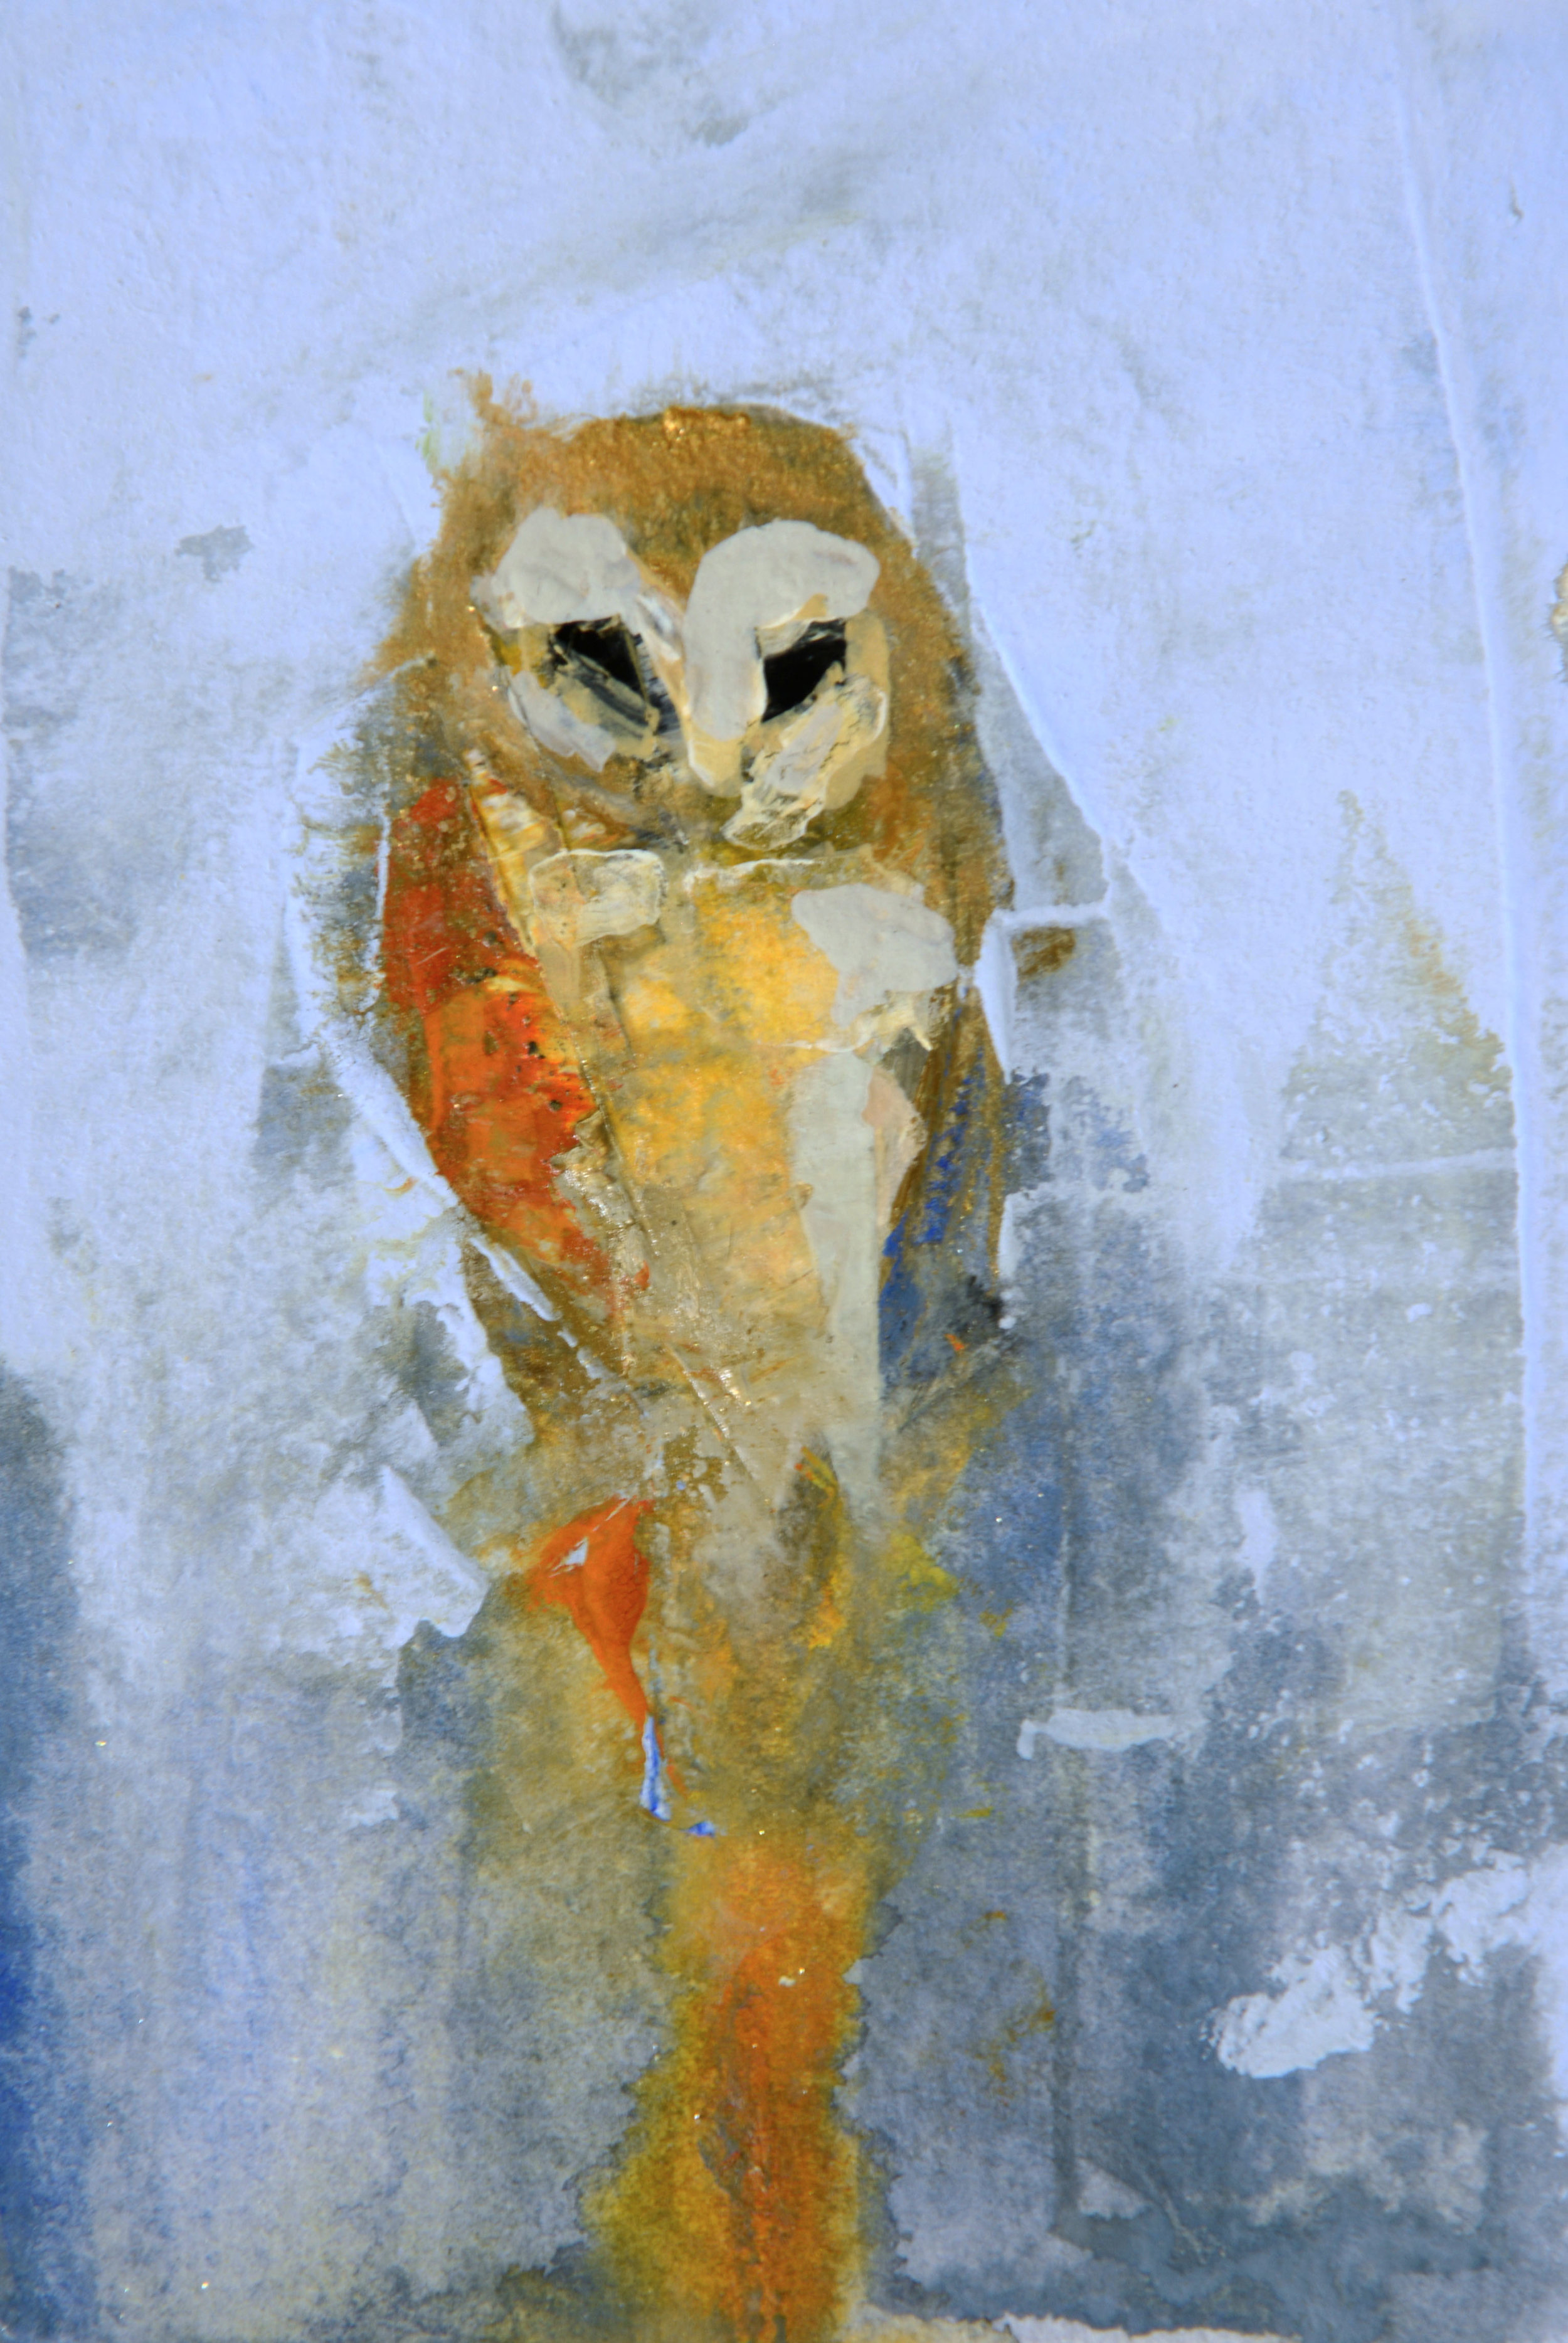 Rebecca_Kinkead_Barn Owl no. 2.MM on paper_inset on 11x7.5.jpg